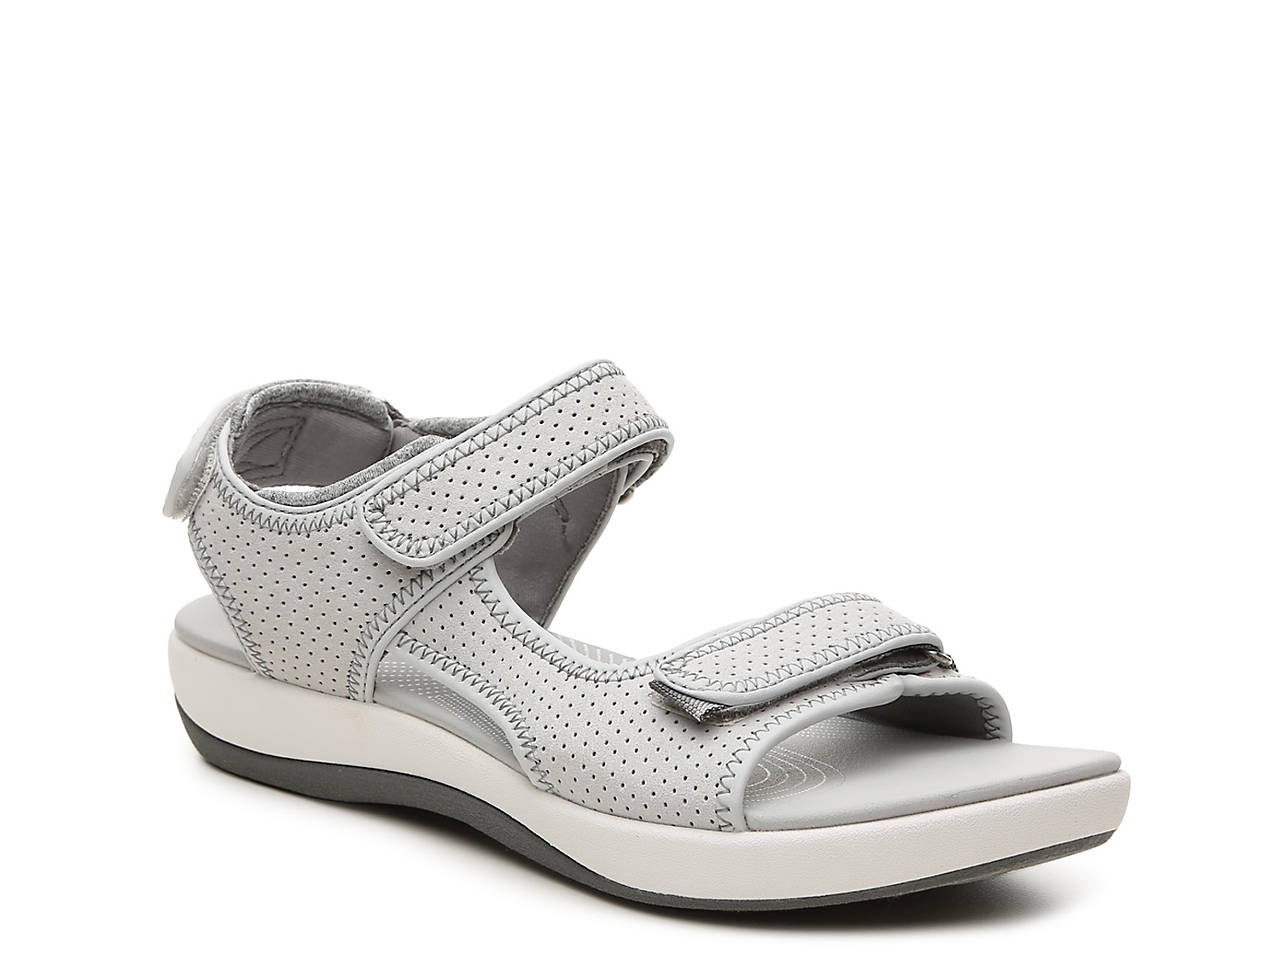 bb243ebadd1 Clarks Brizo Sammie Sport Sandal Women s Shoes